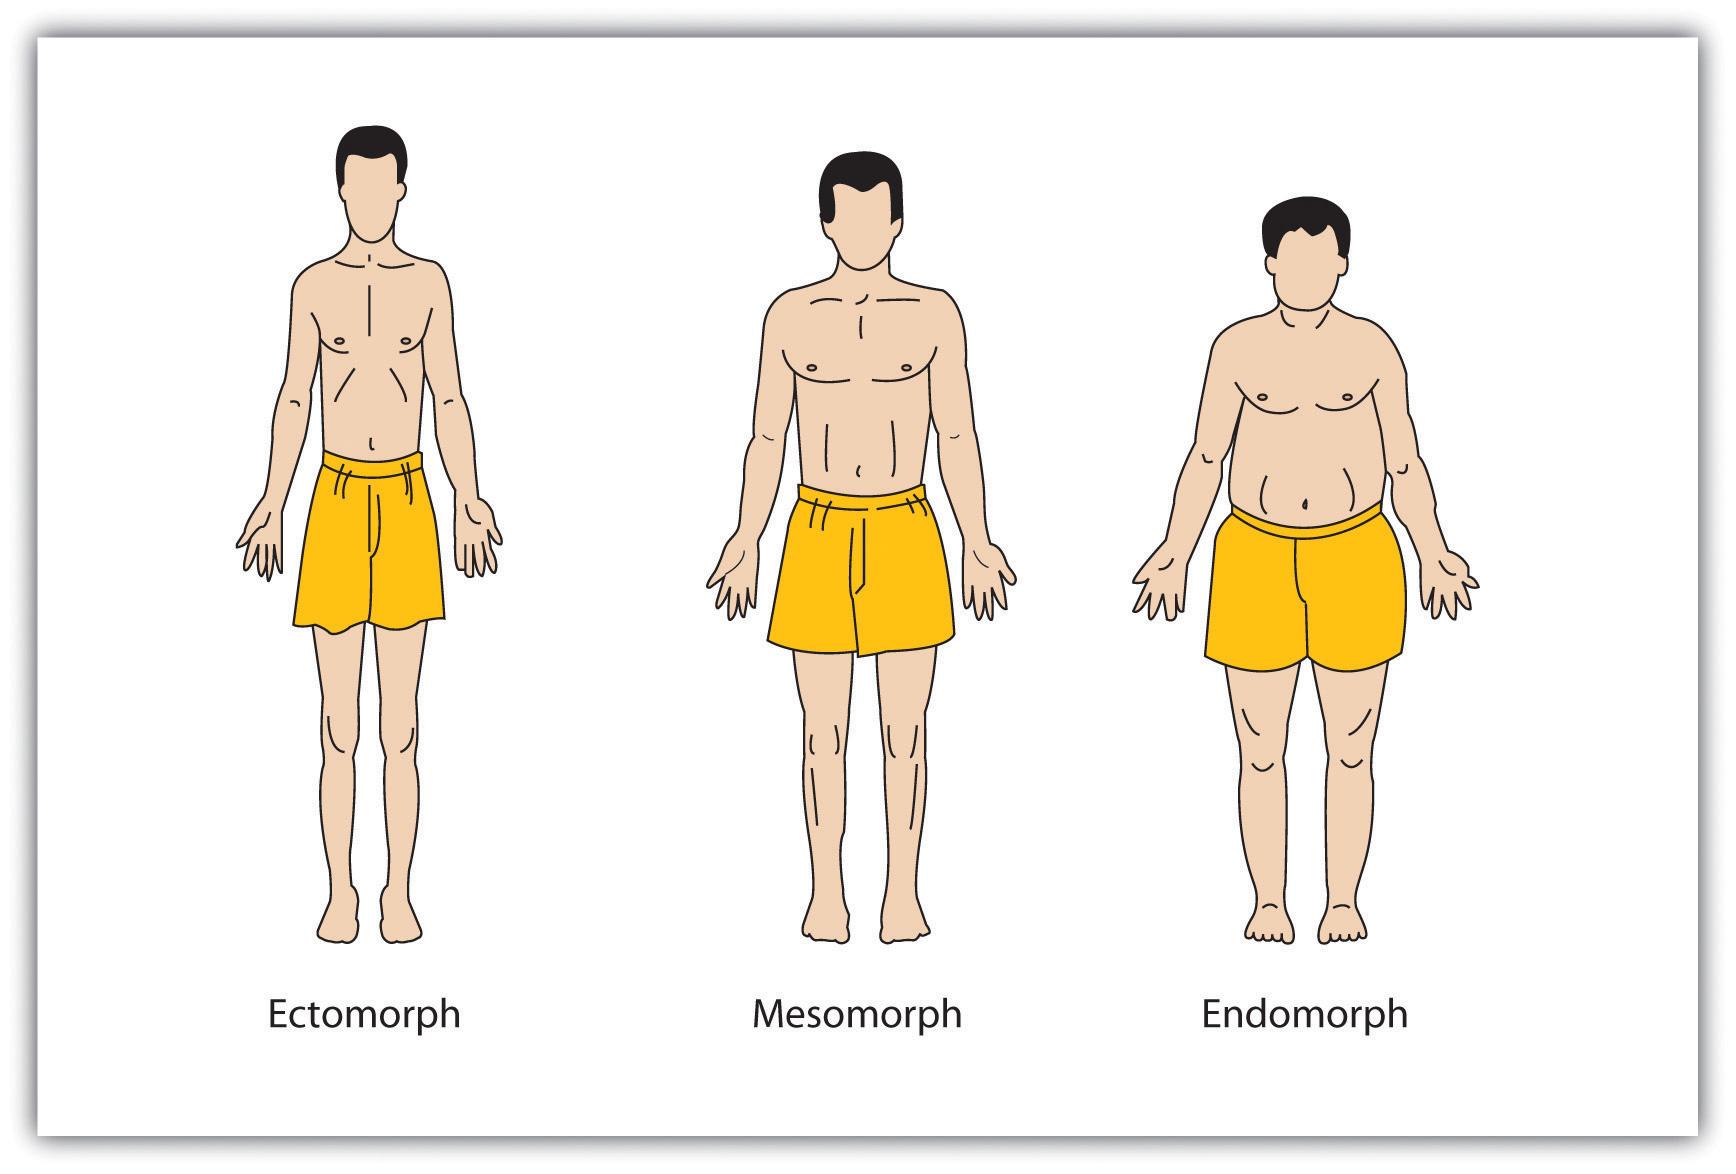 This diagram illustrates three body types: ectomorph, mesomorph, and endomorph.